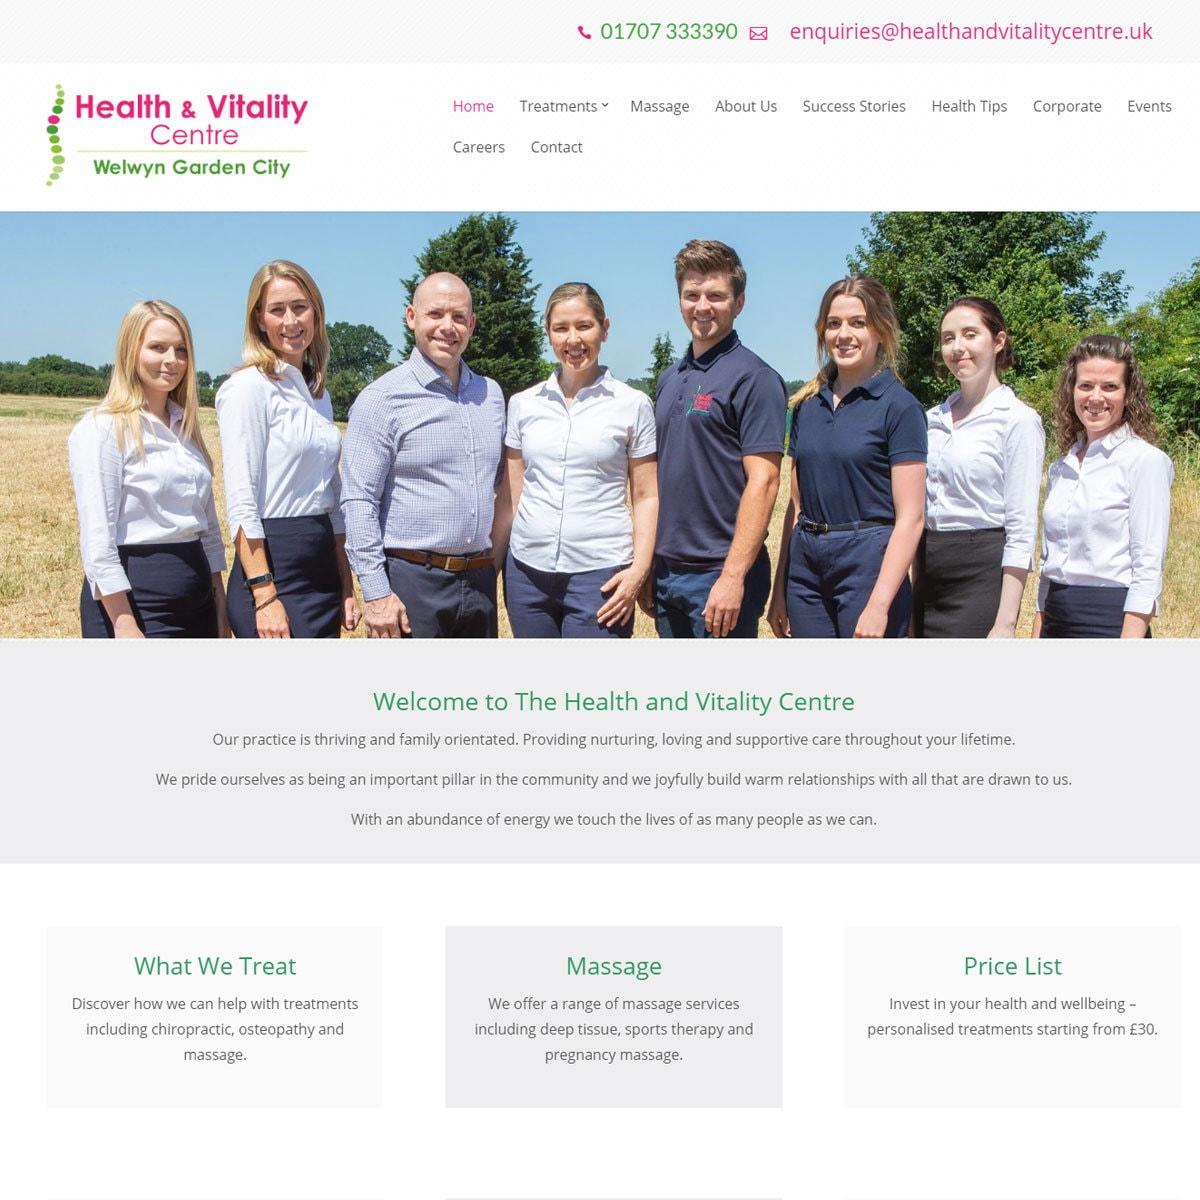 healthandvitalitycentre